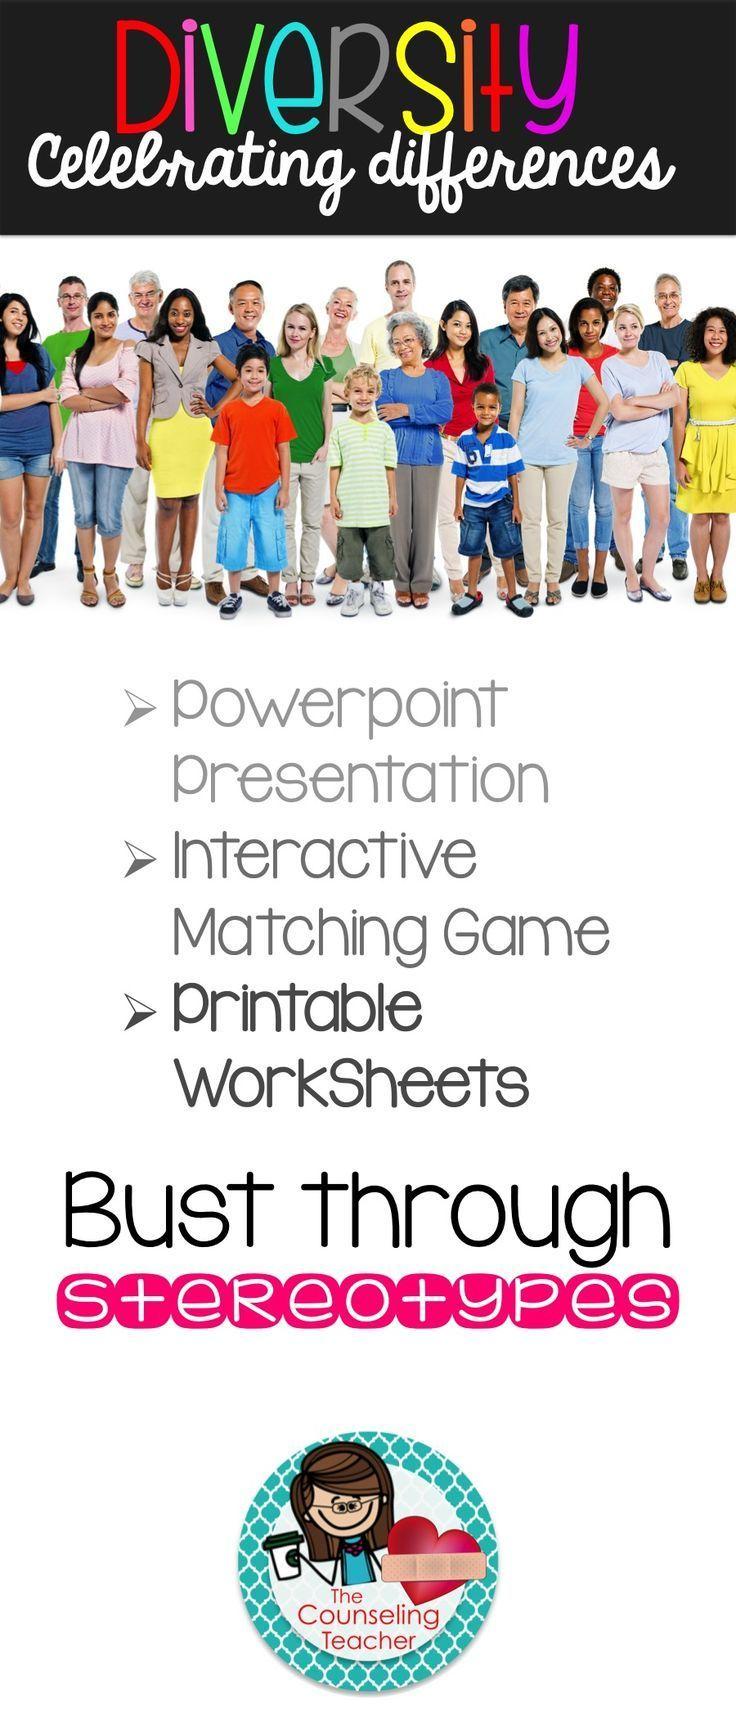 Fpm programme at various b schools